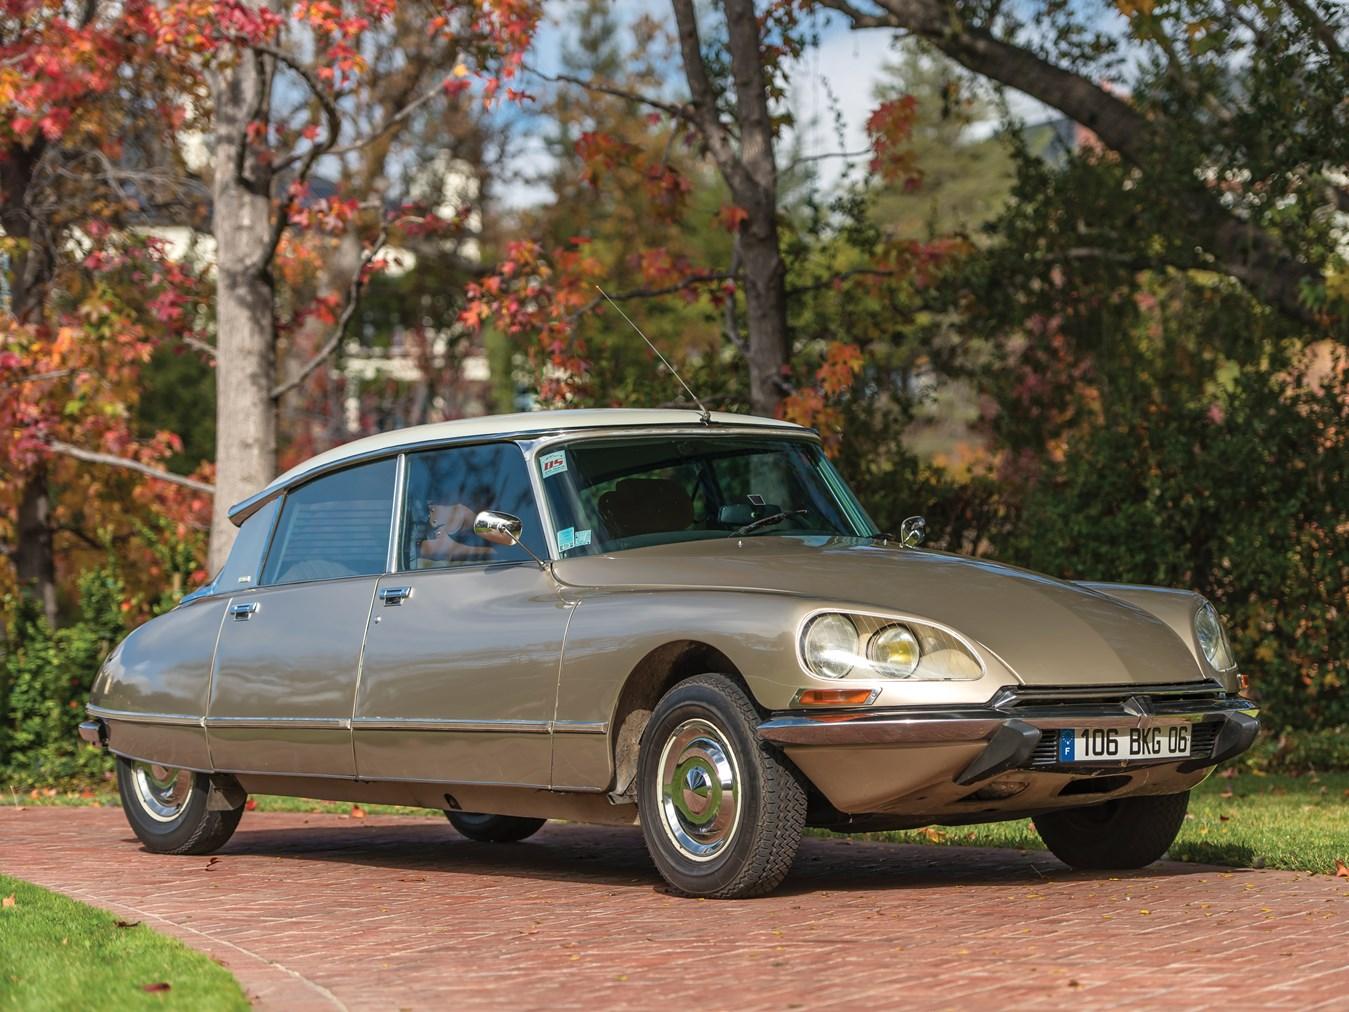 Bizaare Looking 1970 Citroën DS 21 Pallas In Depth Review